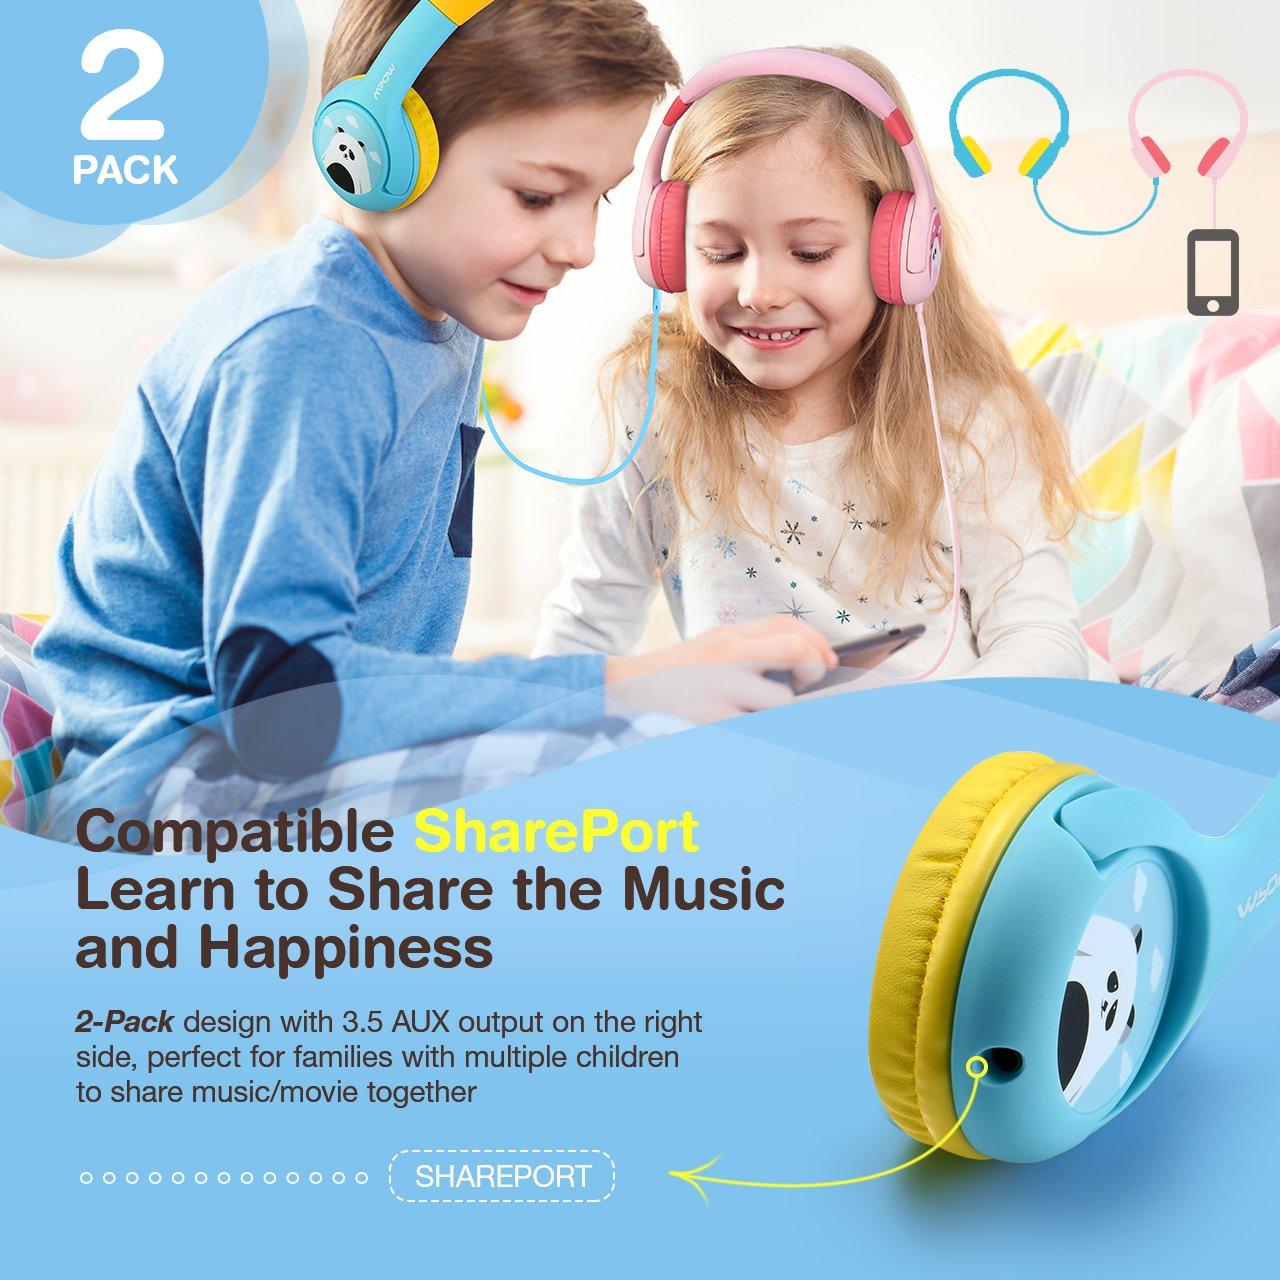 Amazon.com: Mpow (2-Pack) Kids Headphones, Wired On-Ear Headphones ...